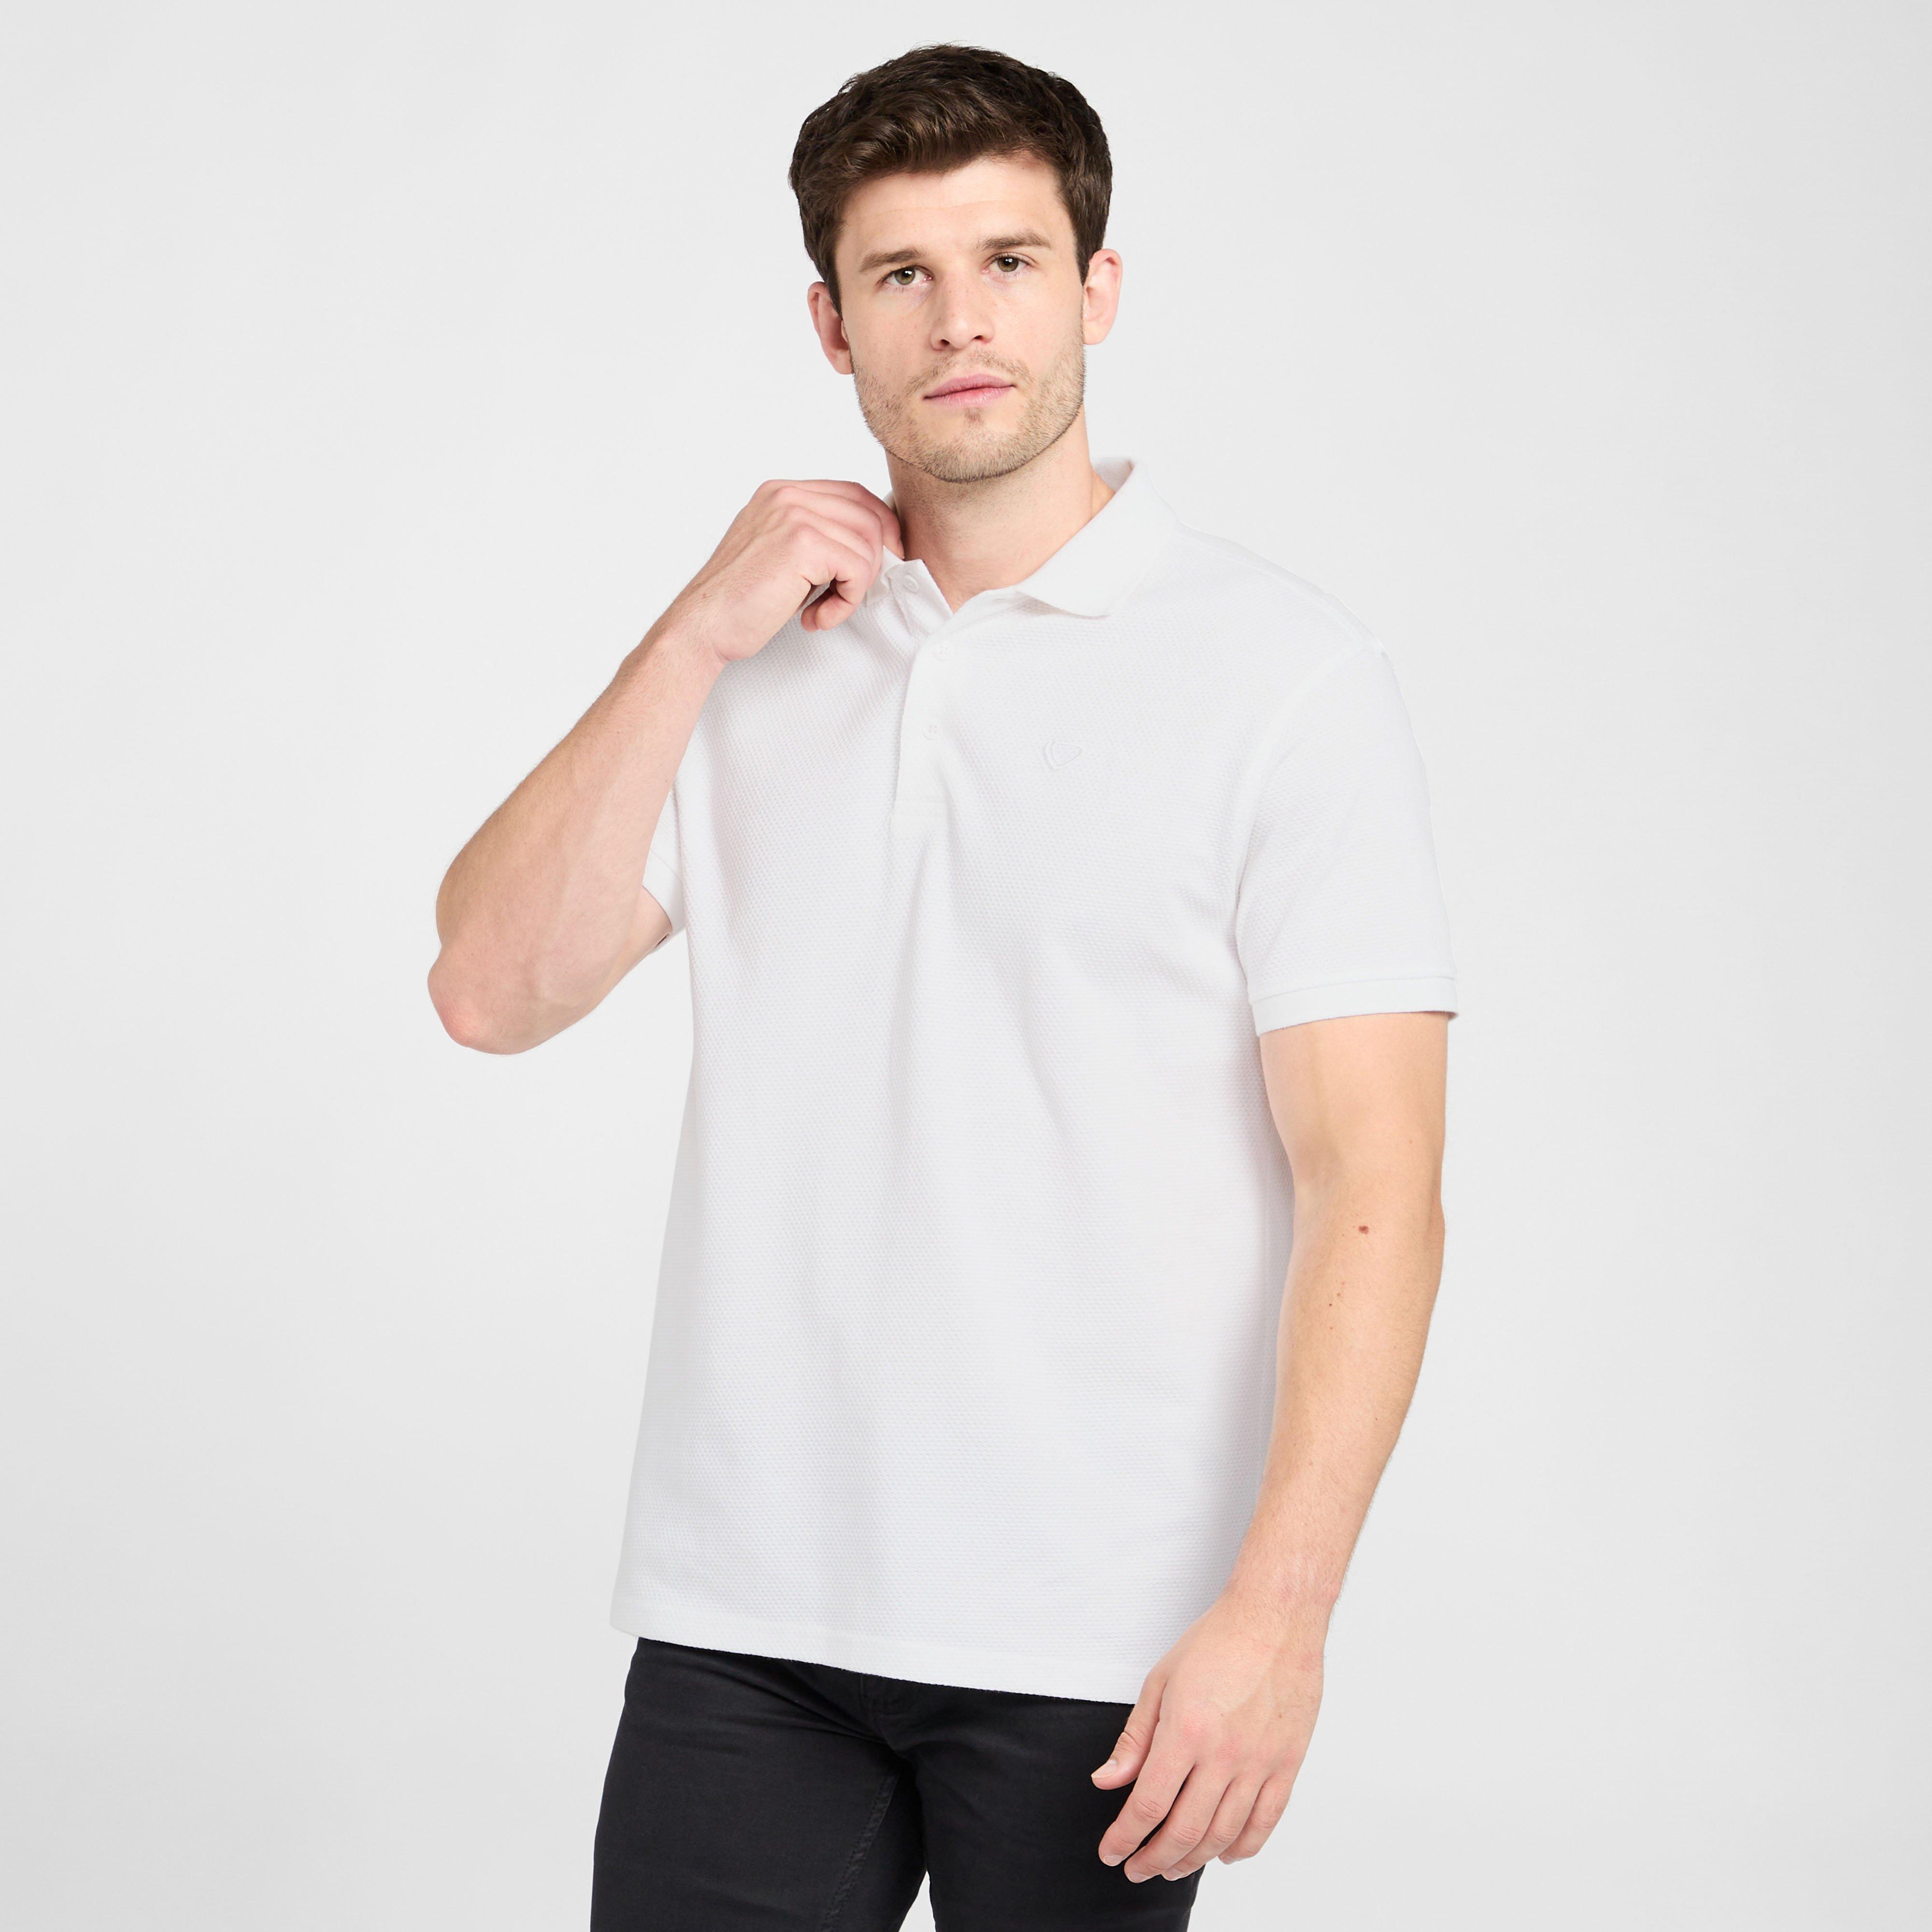 Brasher Brasher Mens Polo Shirt - White, White